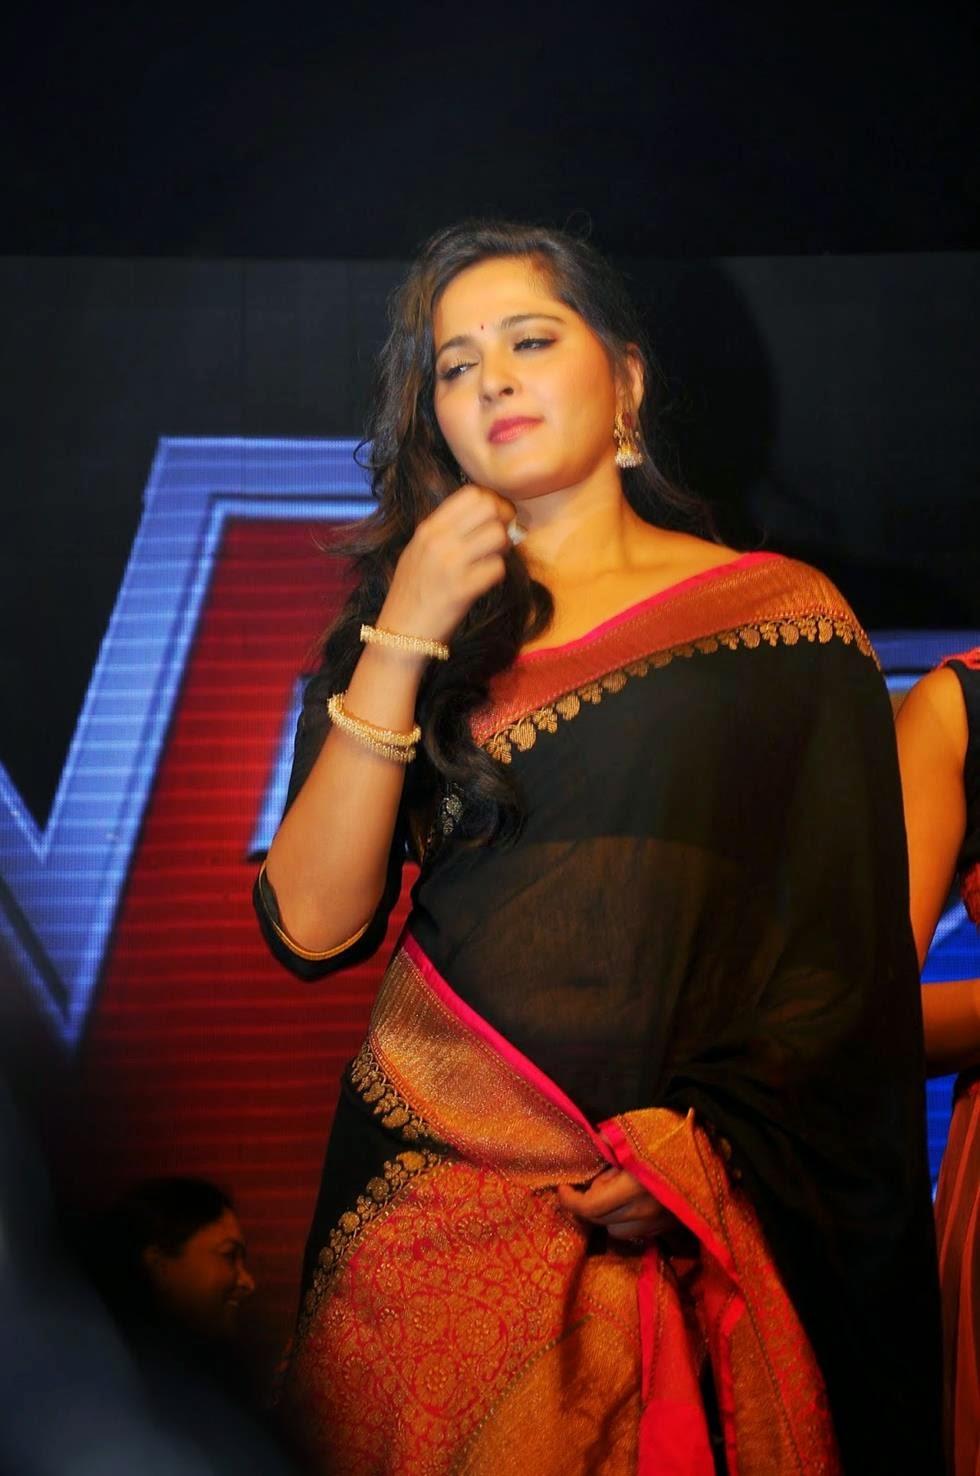 Anushka Shetty Latest Navel Show In Transparent Black